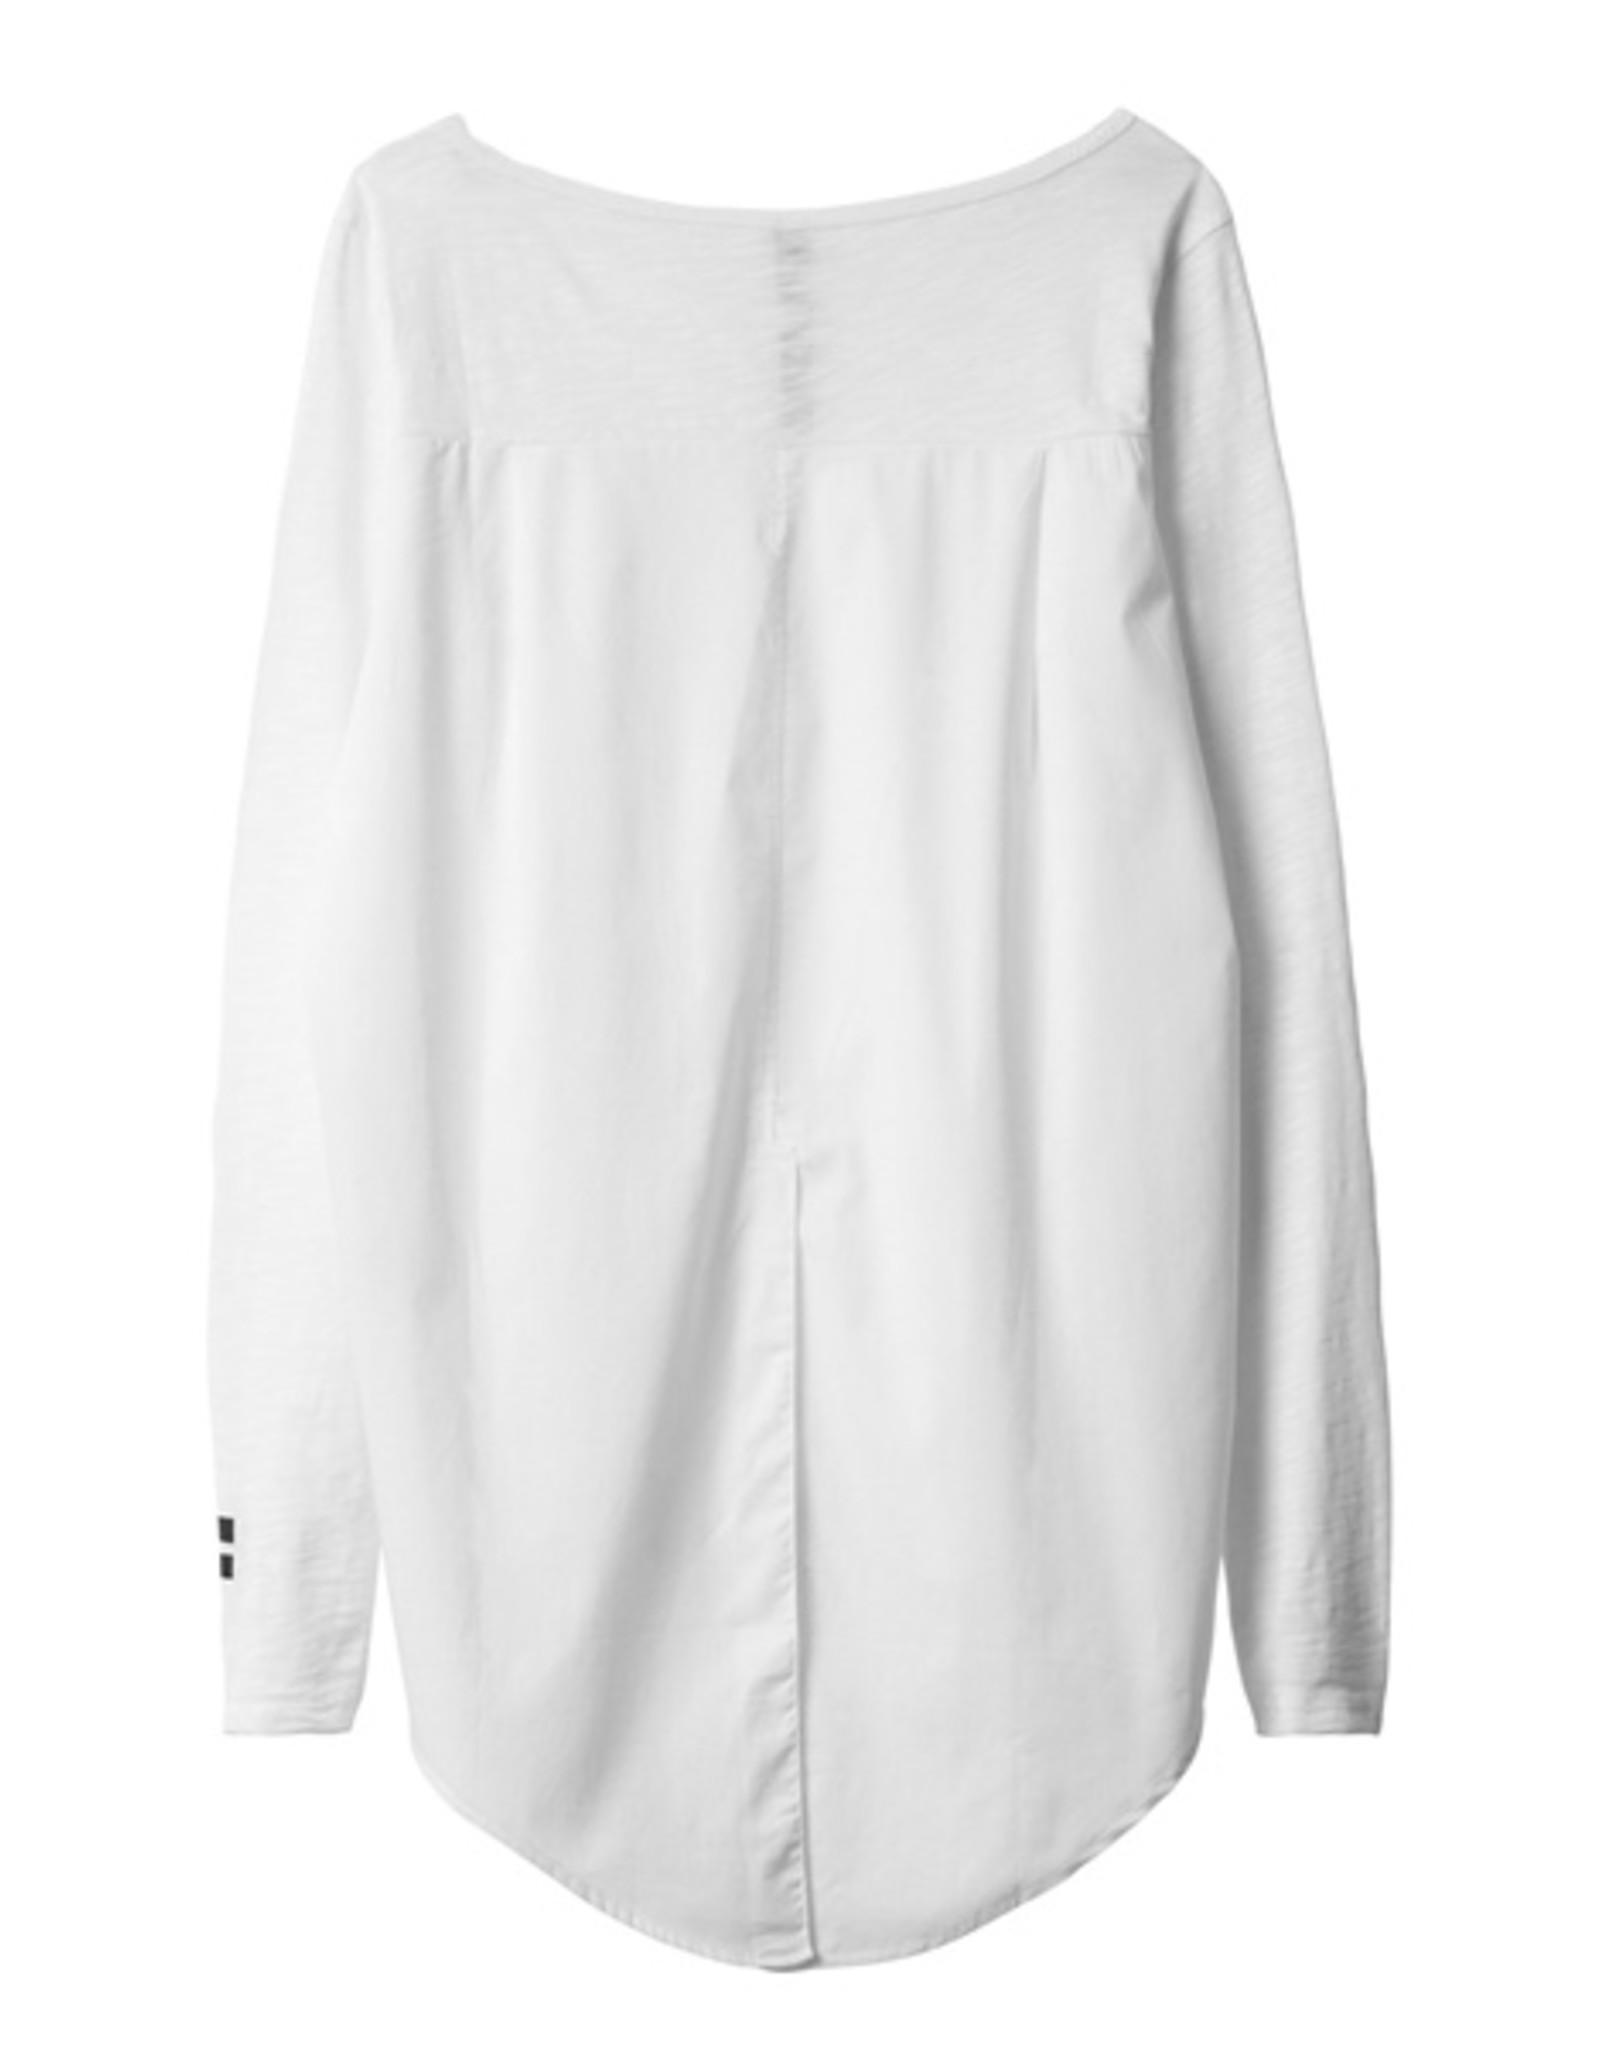 Little 10 Days Smoking Shirt White